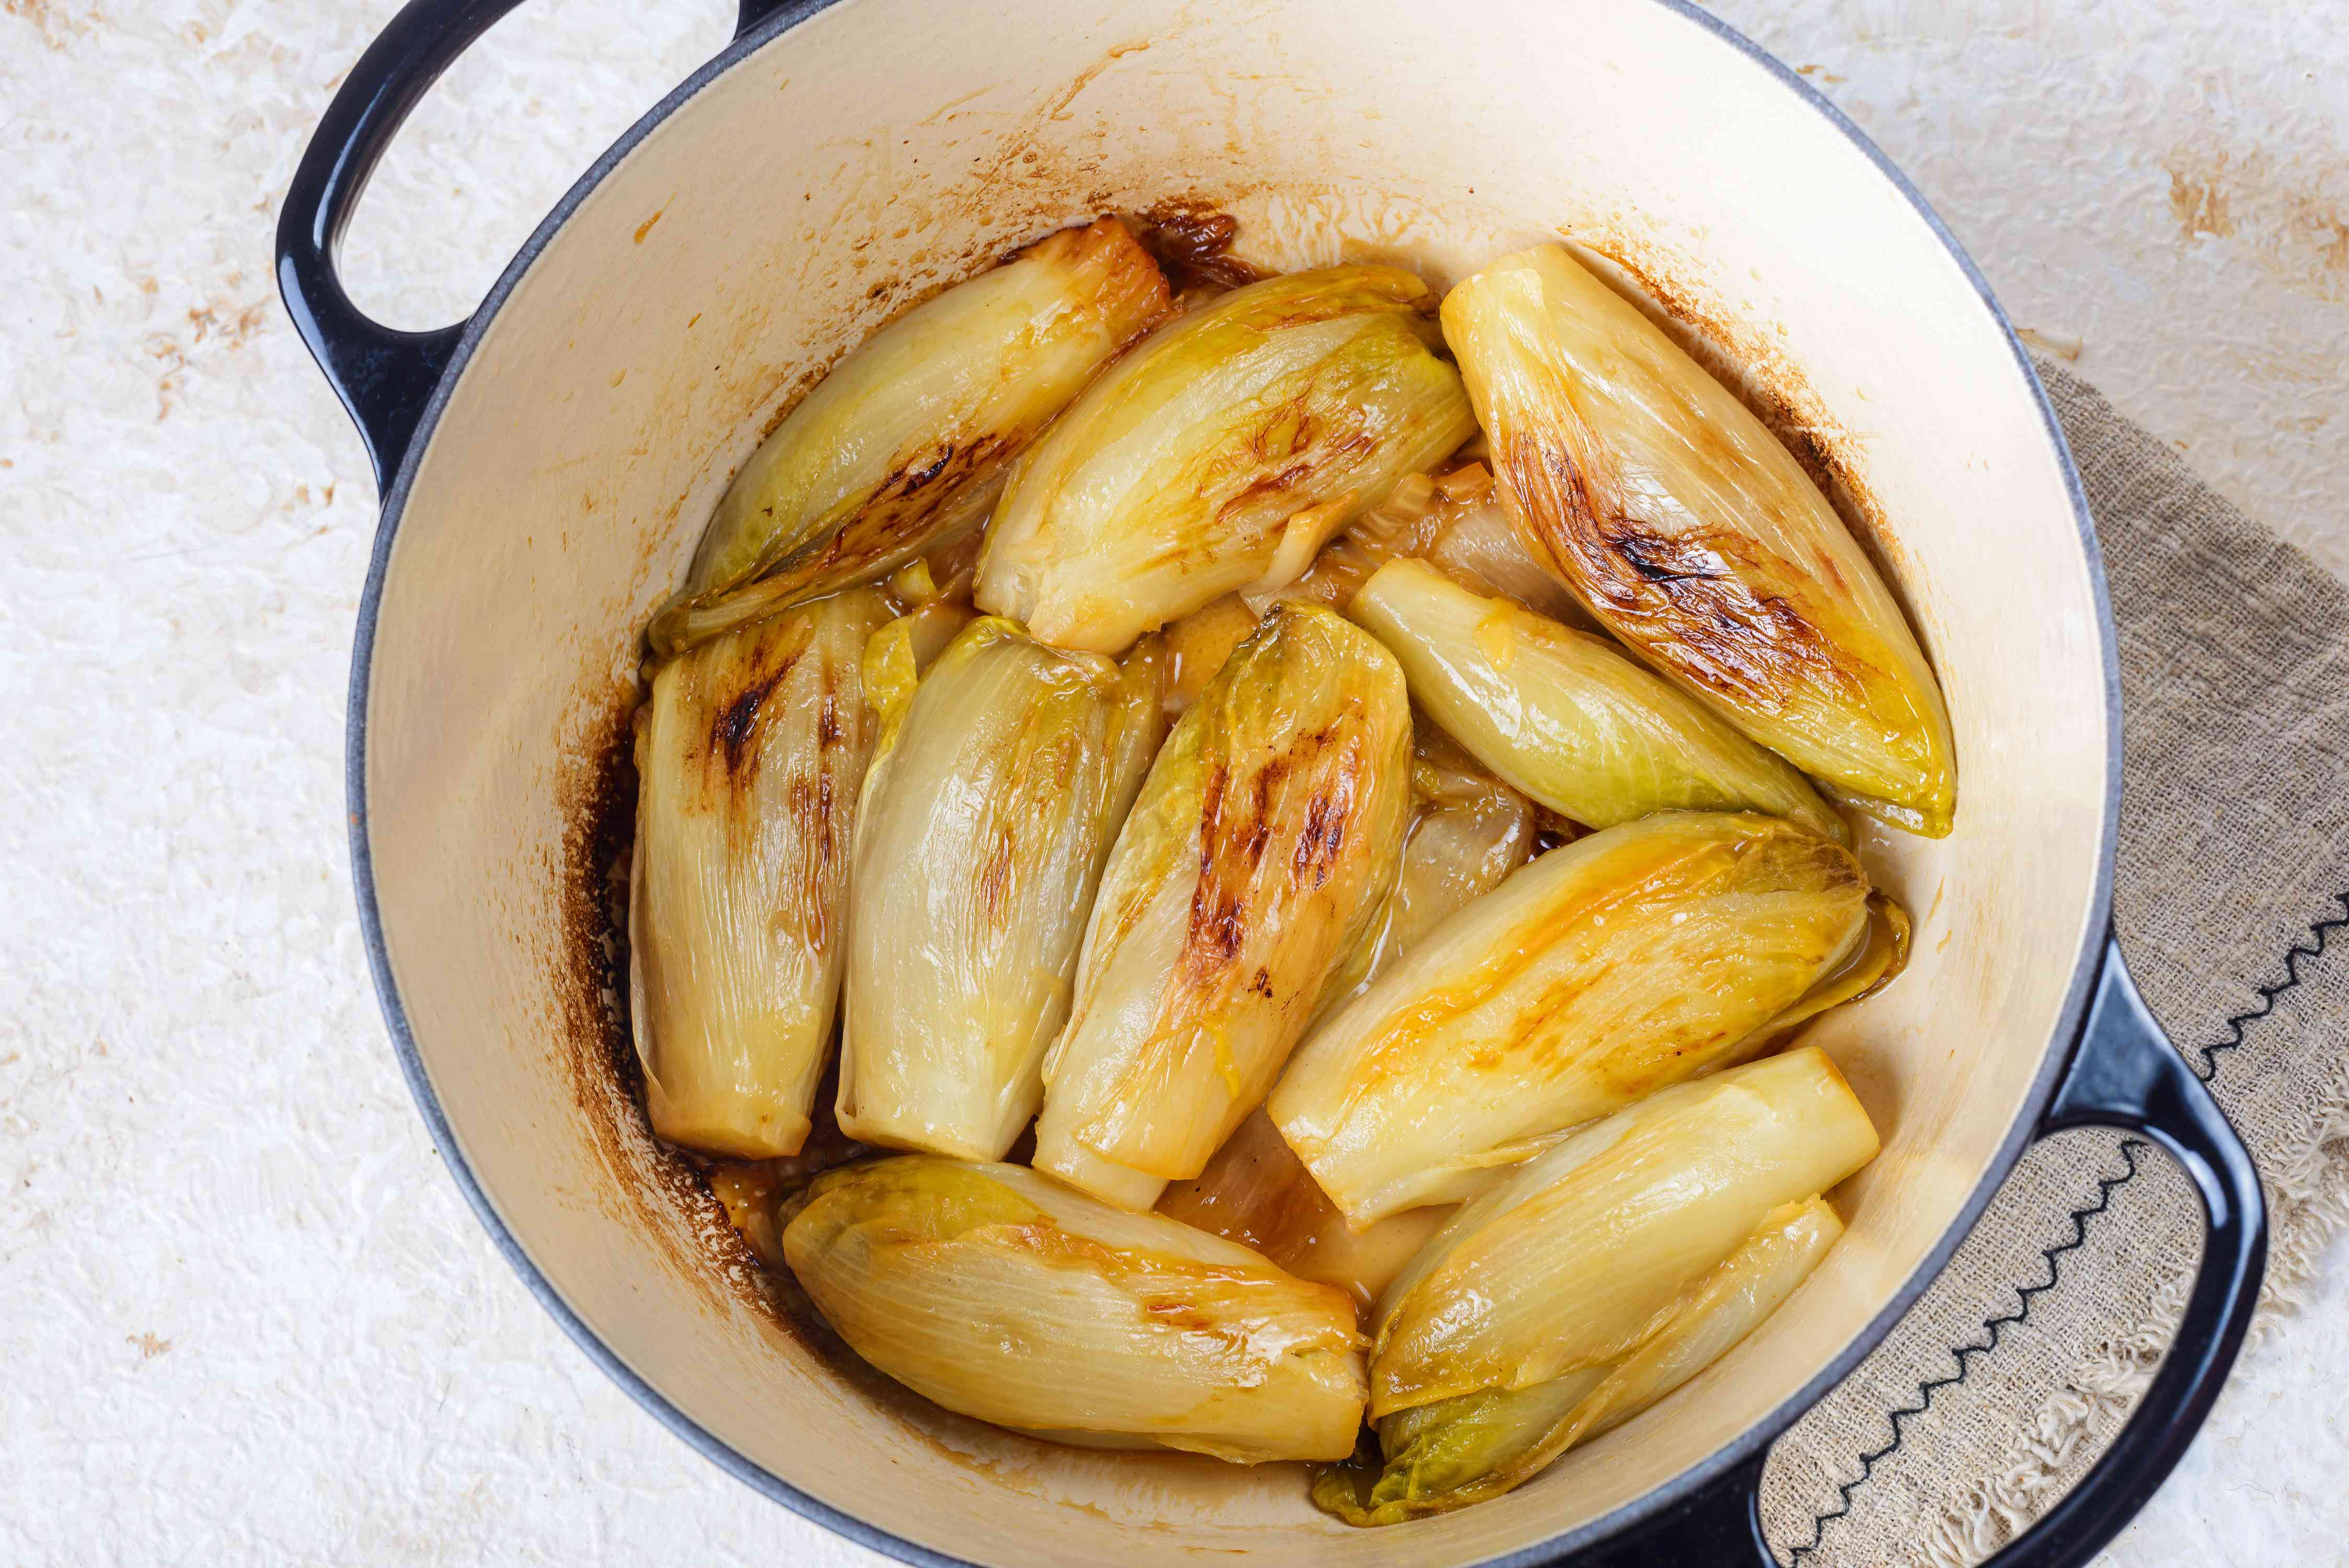 Braised endives in pot